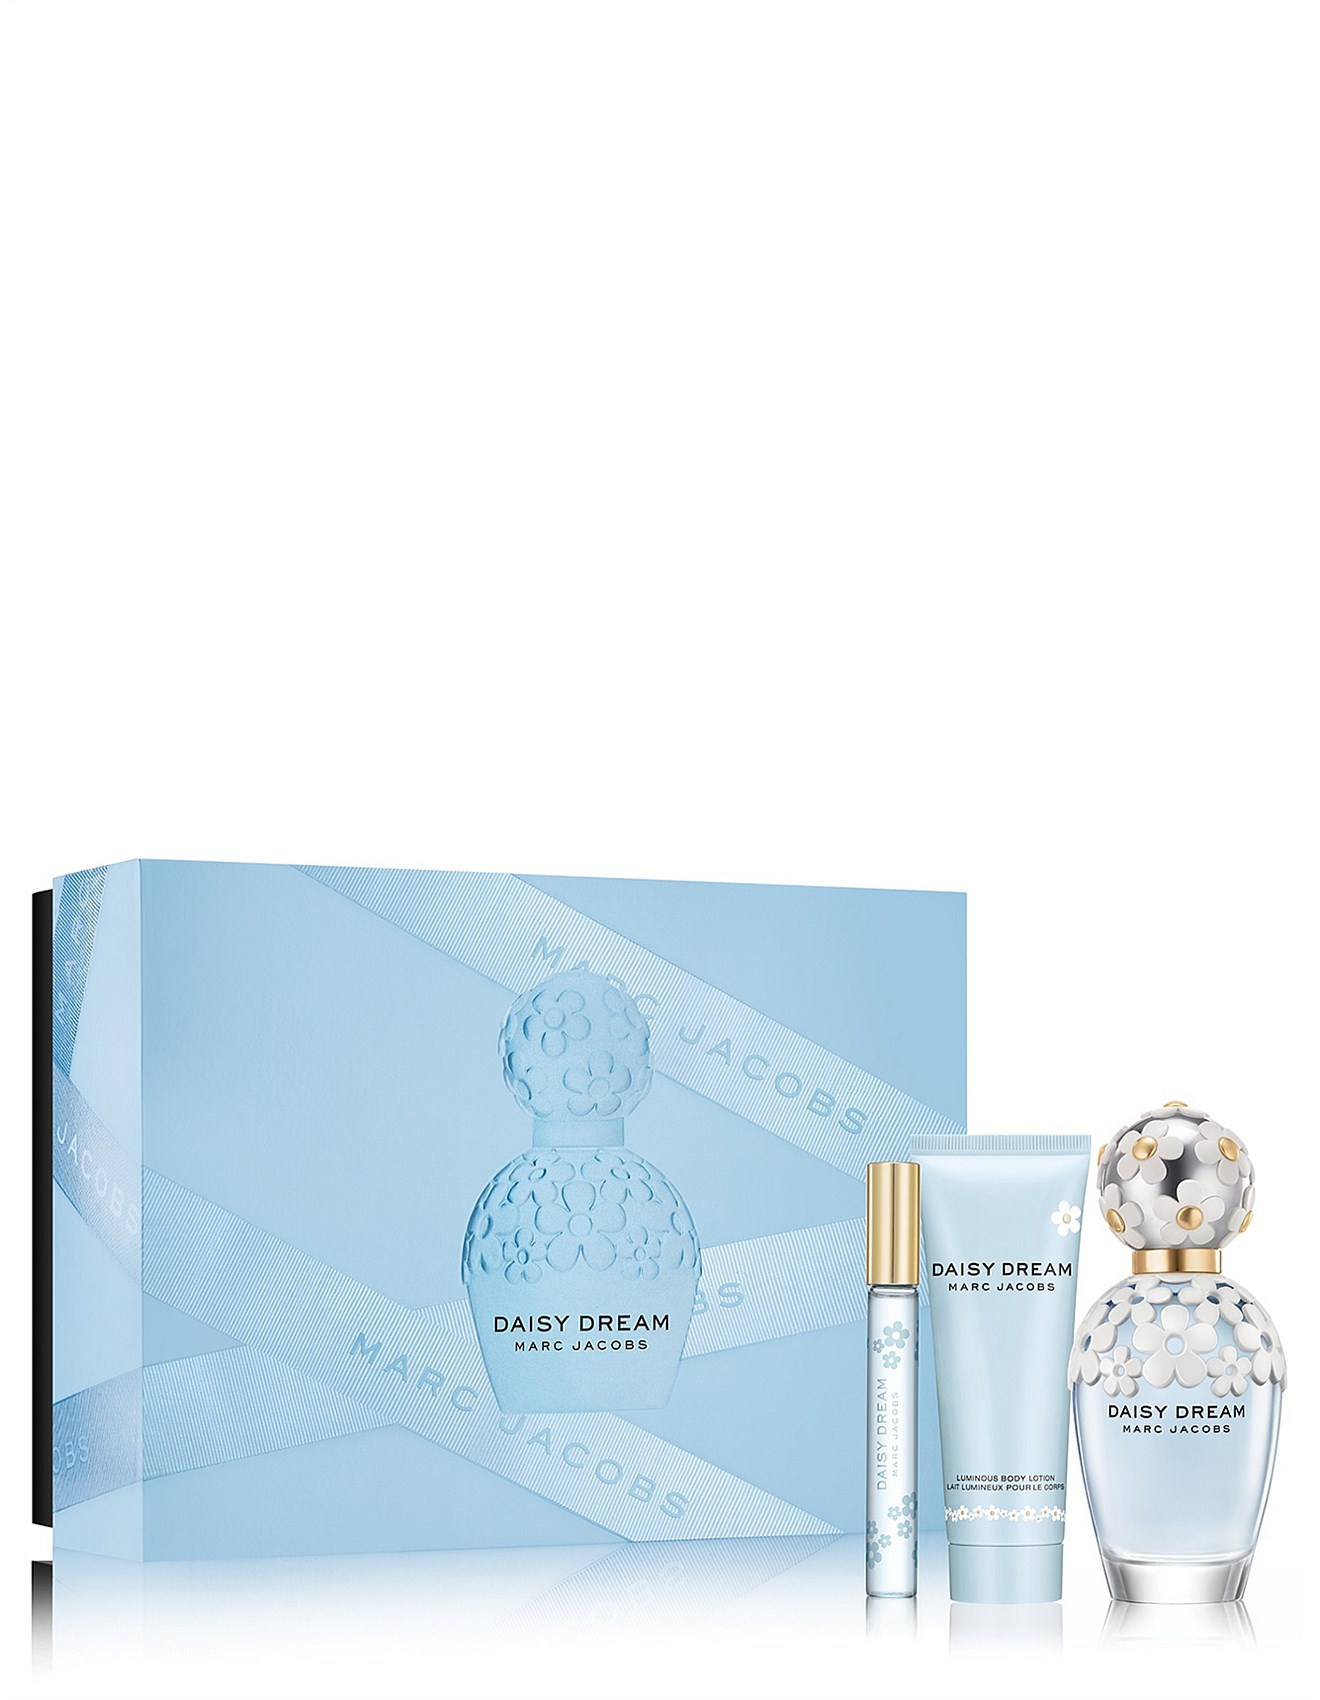 3e8af6e1cbad Perfume | Buy Fragrances & Perfume Online | David Jones - Marc ...